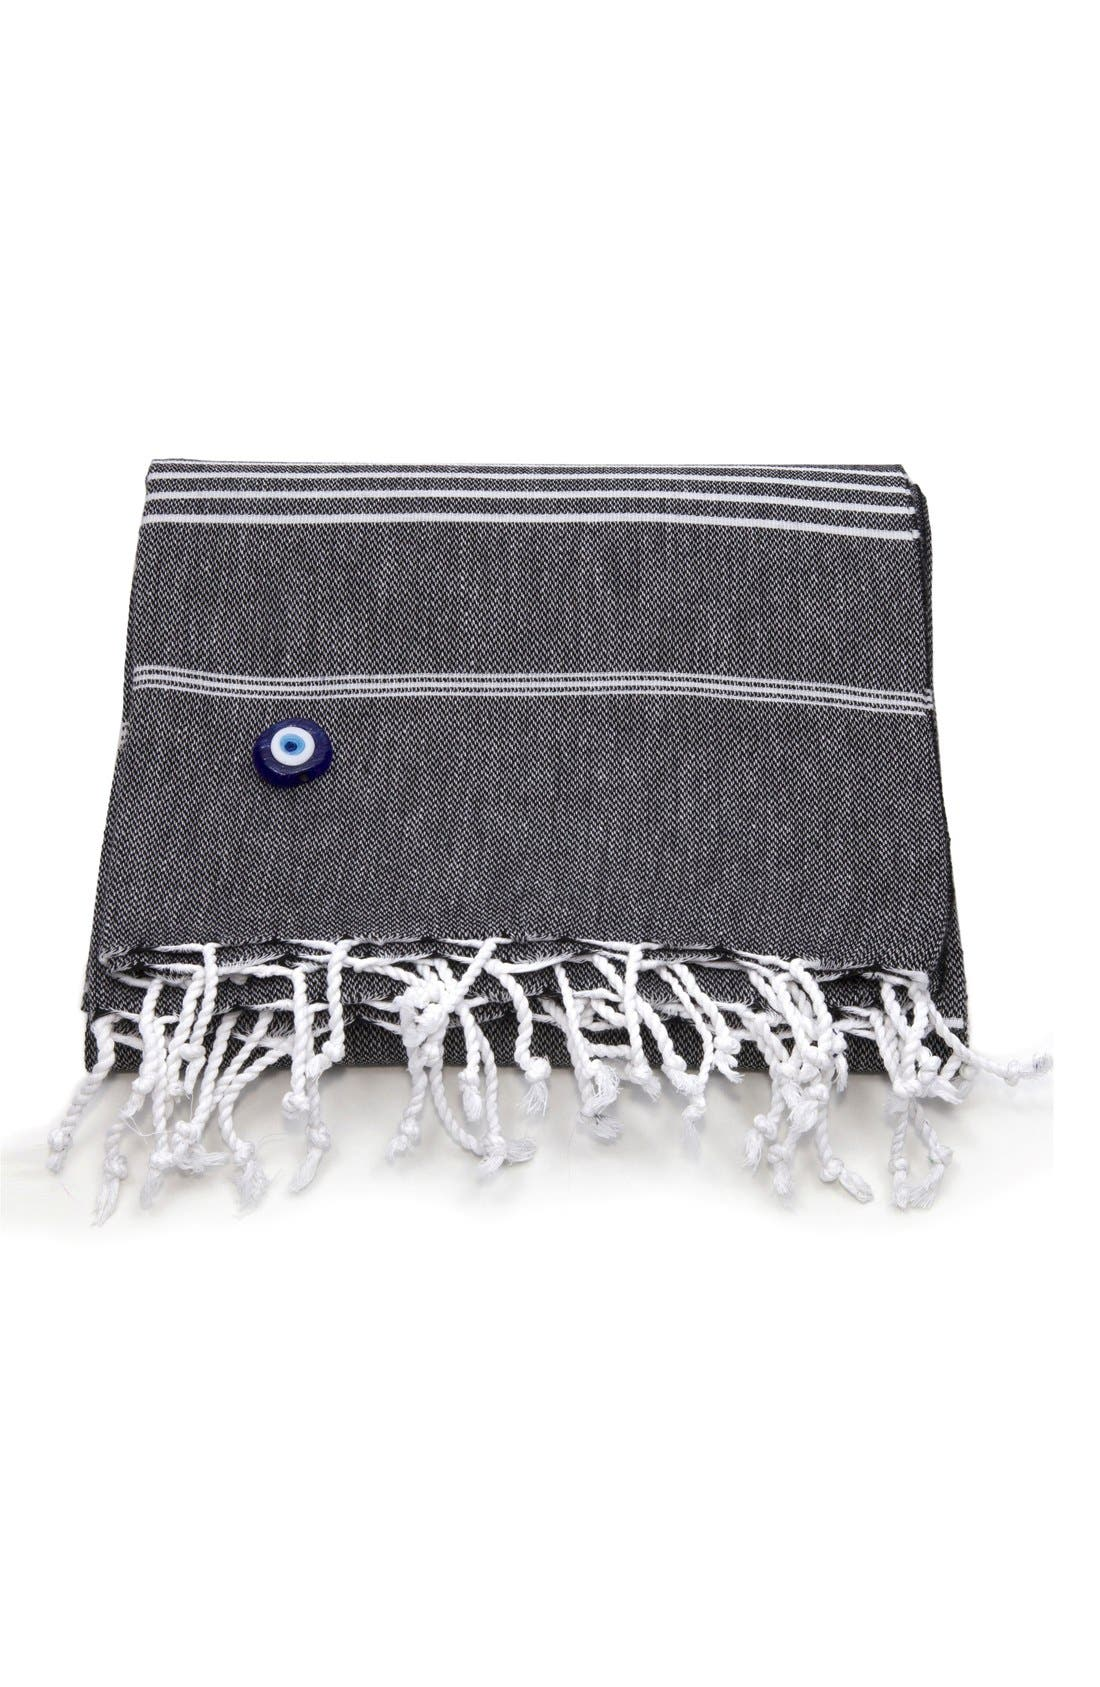 'Lucky' Turkish Pestemal Towel,                         Main,                         color, BLACK